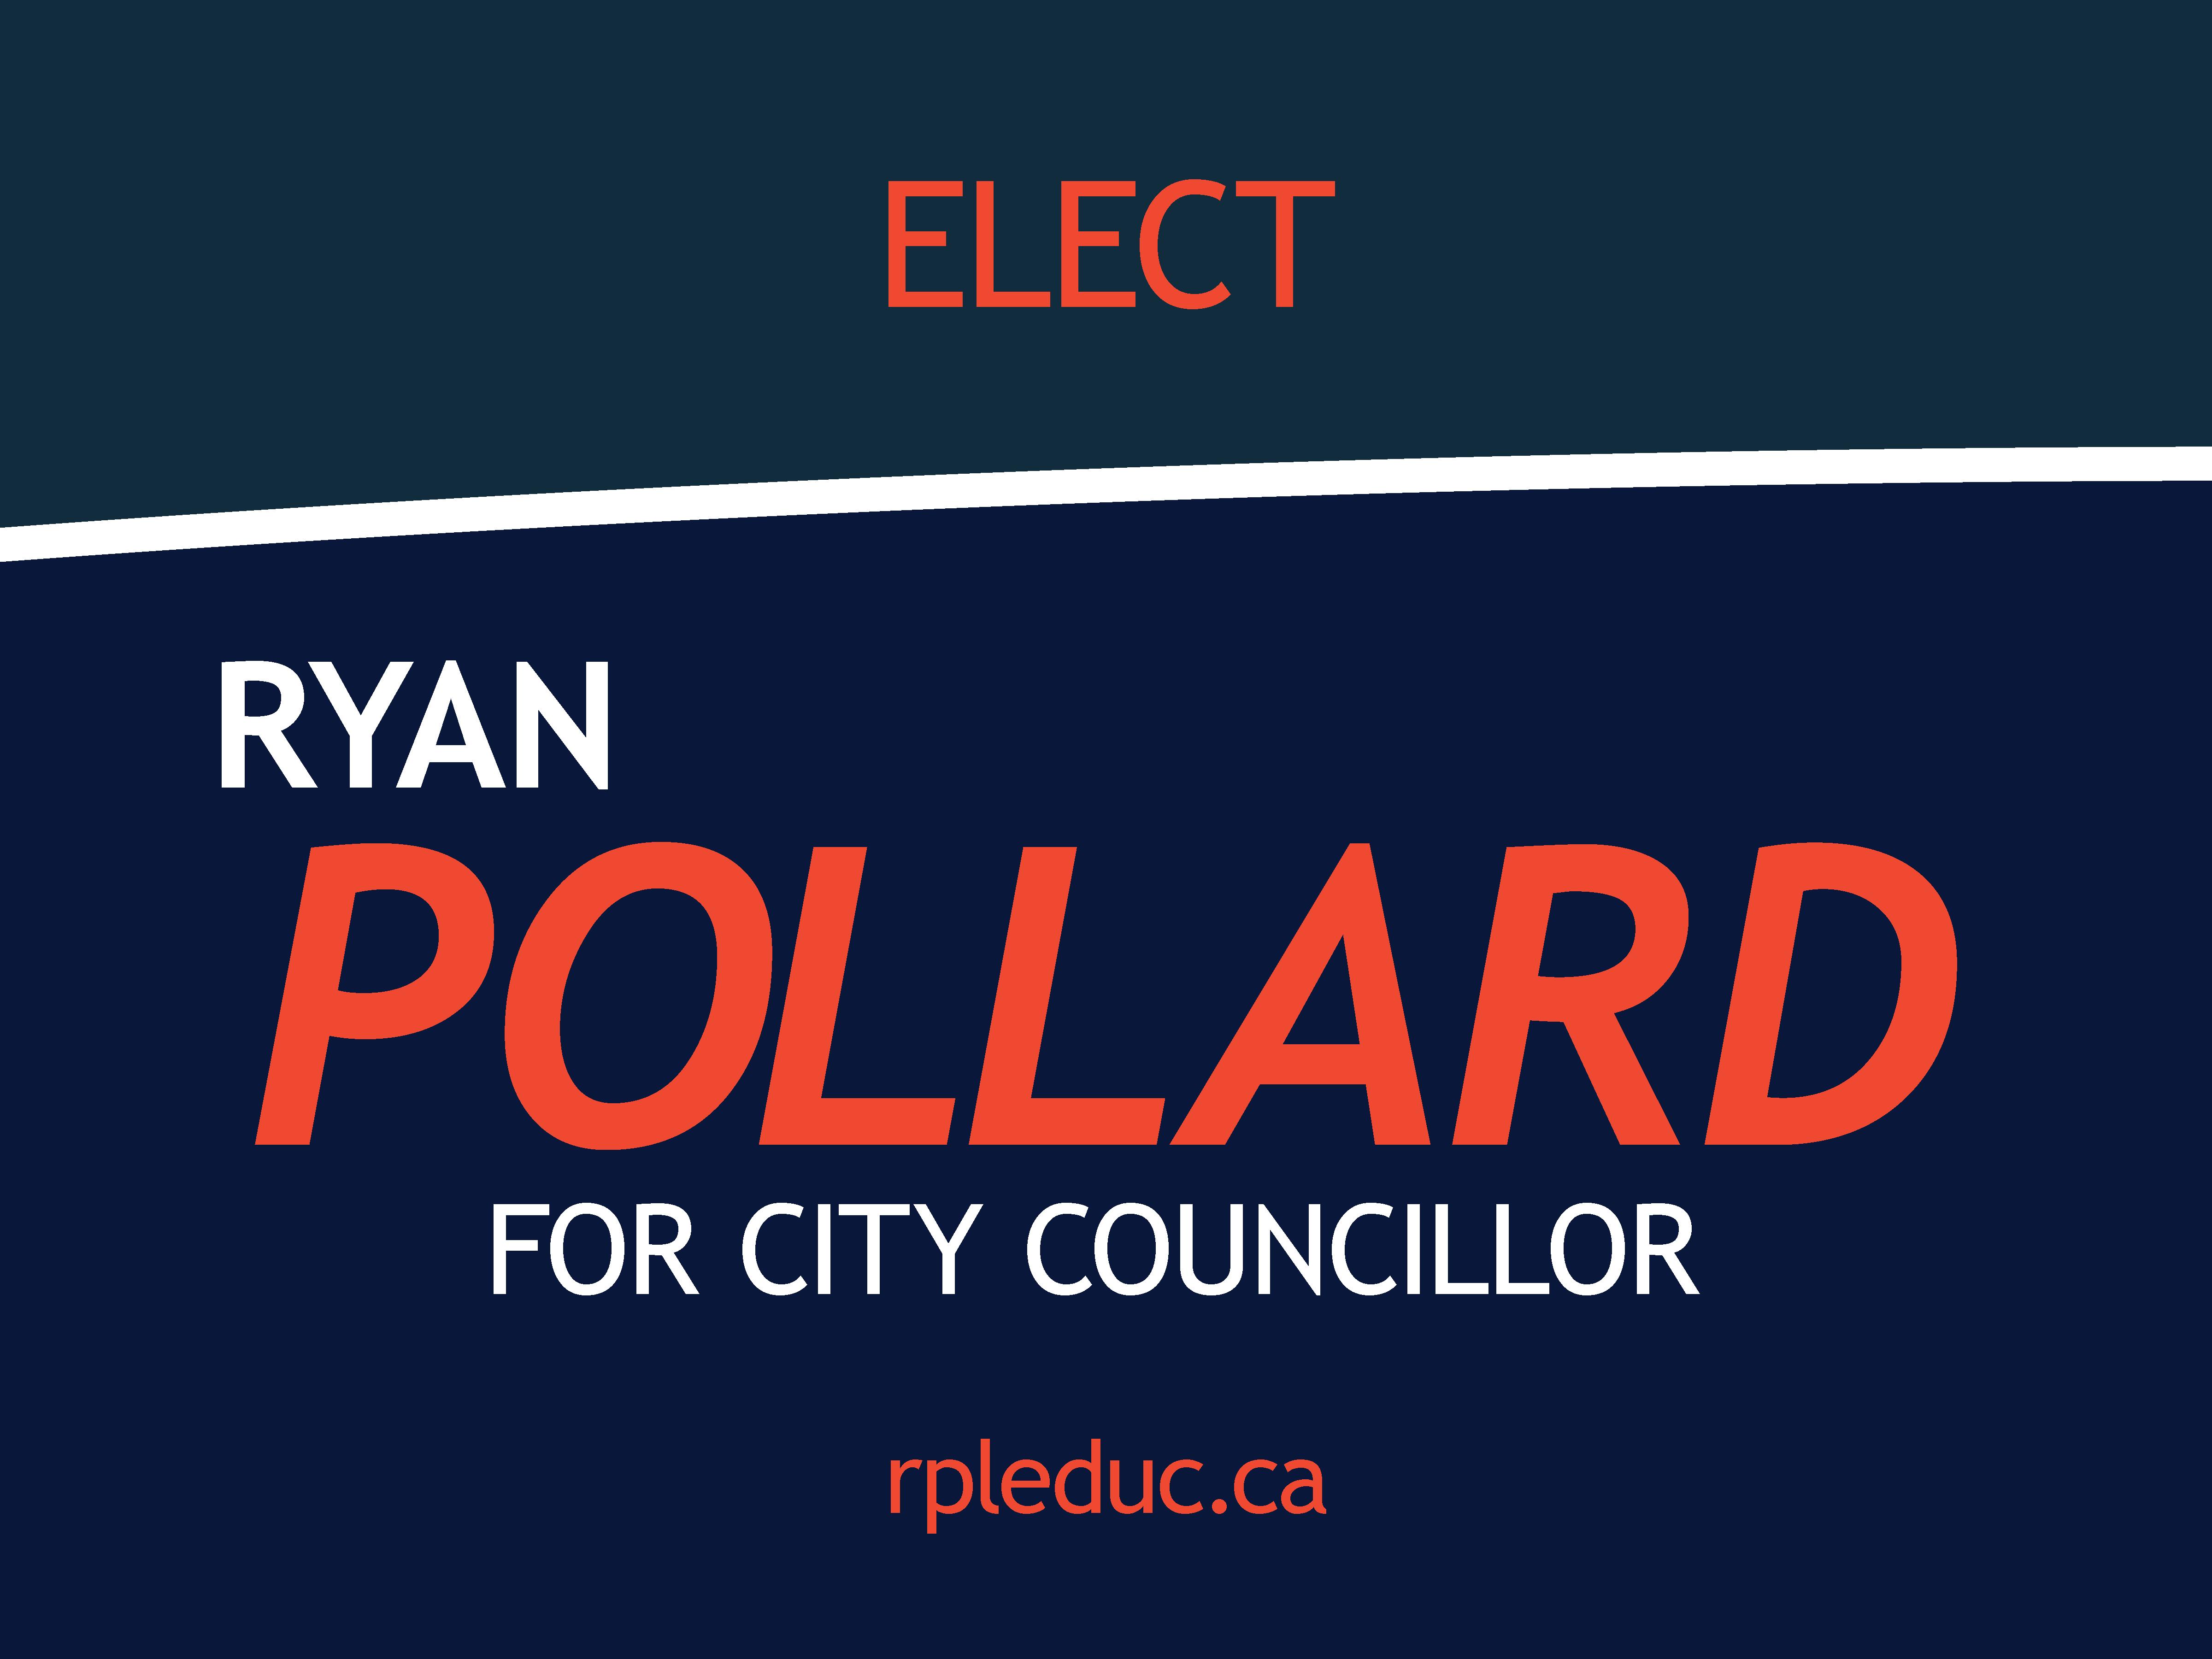 Ryan-Pollard-Sign-24_x18__(1).png